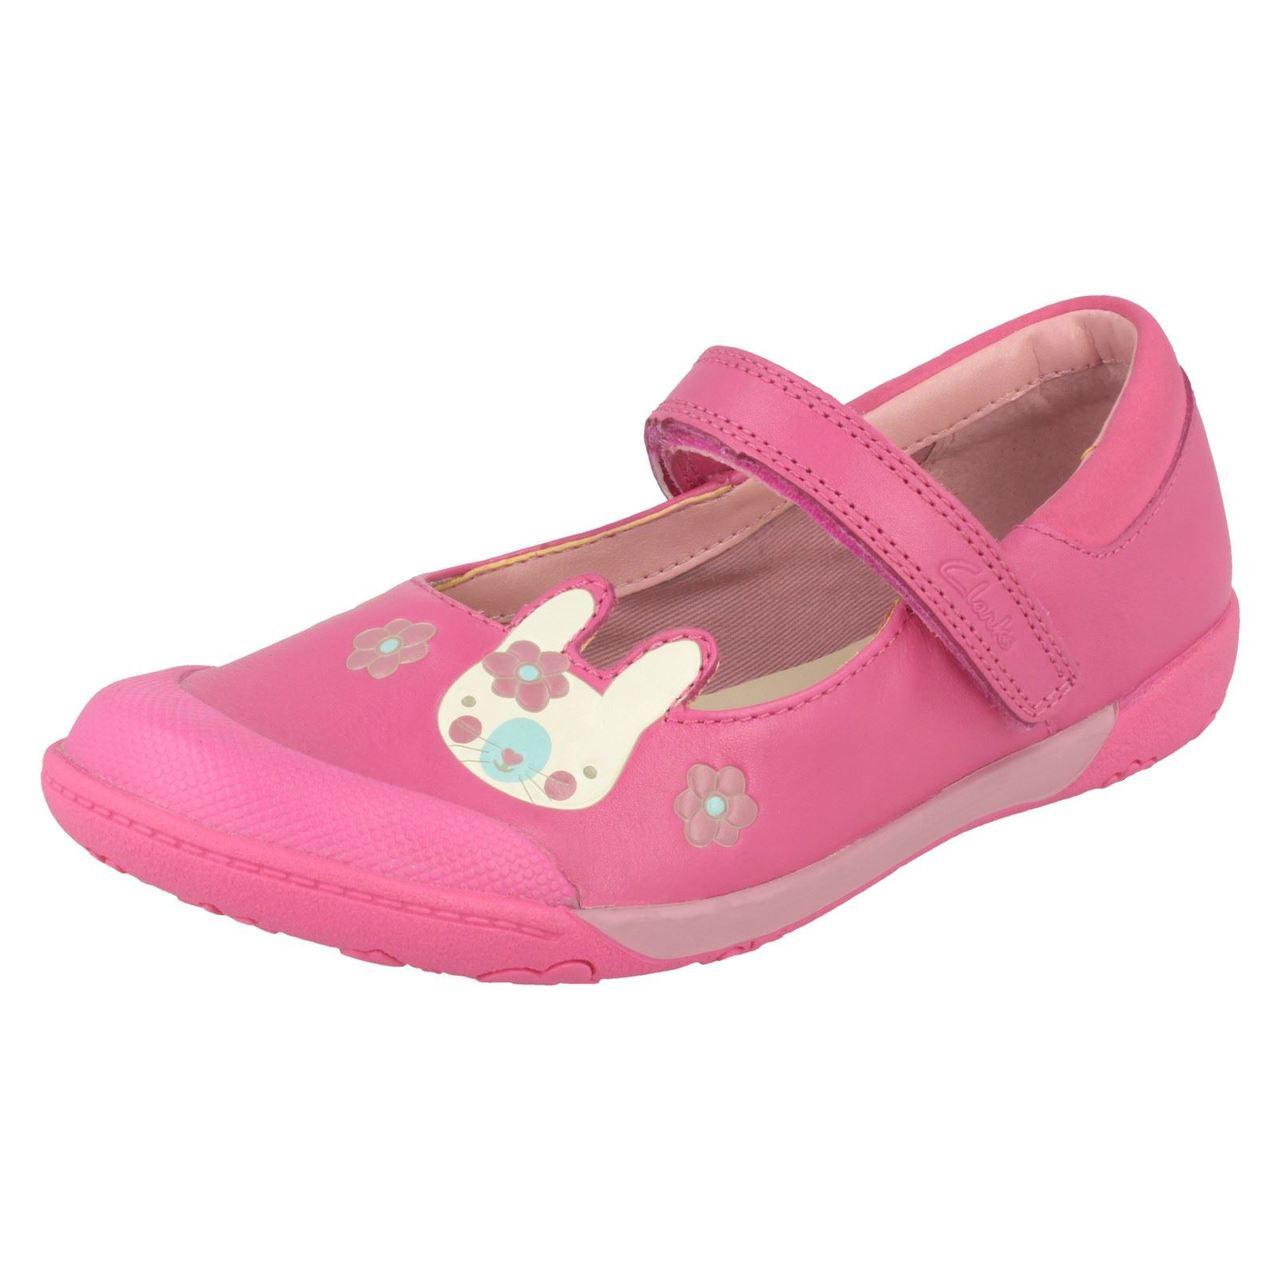 Nibbles Sam /'Girls Clarks/' Binkies School Shoes